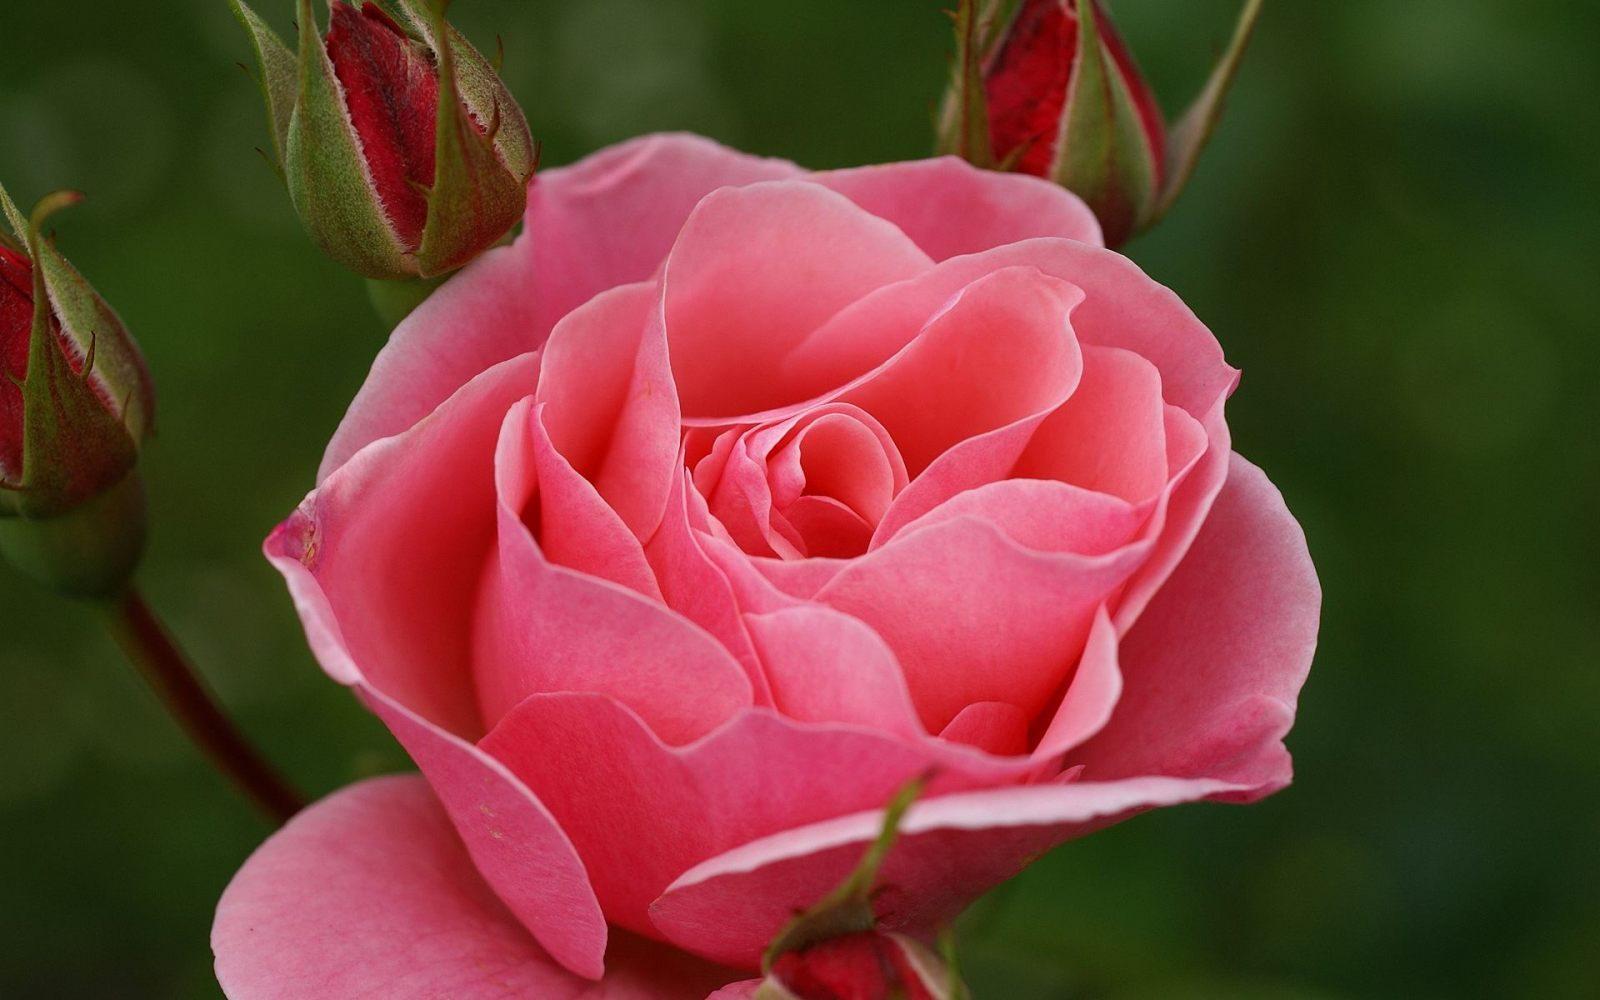 galer a de im genes rosas rosadas. Black Bedroom Furniture Sets. Home Design Ideas